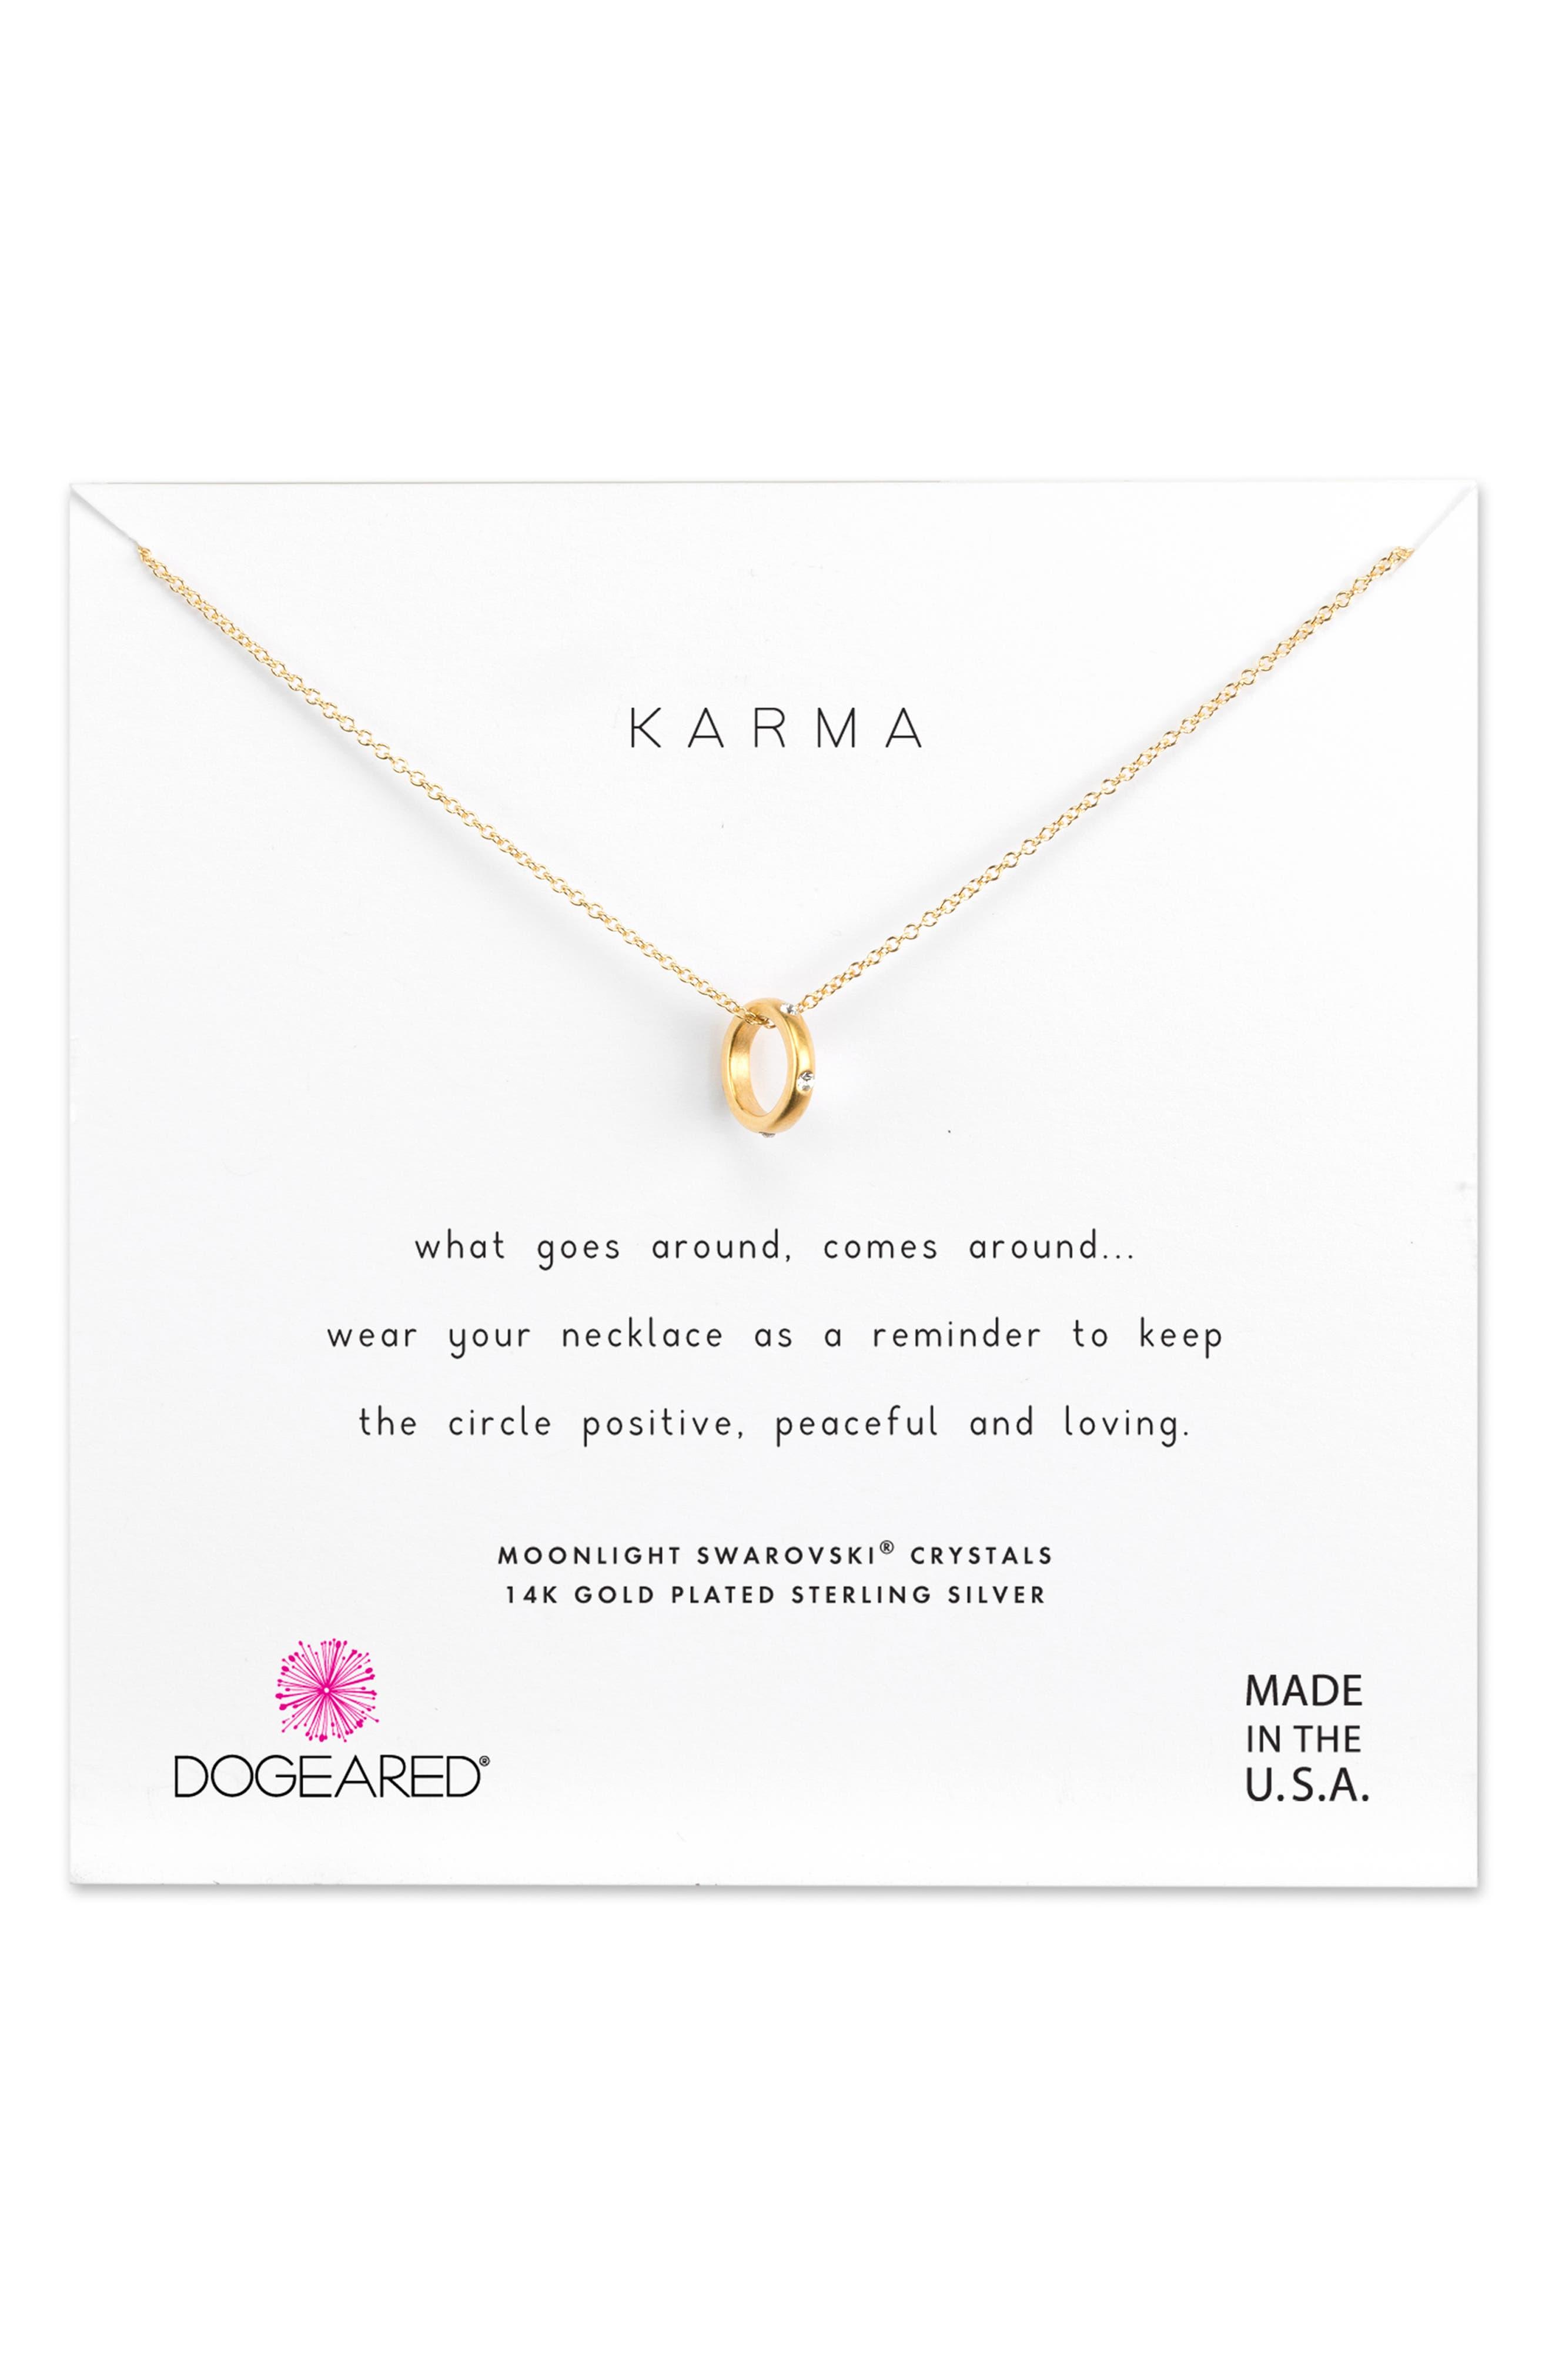 Dogeared Karma Necklace